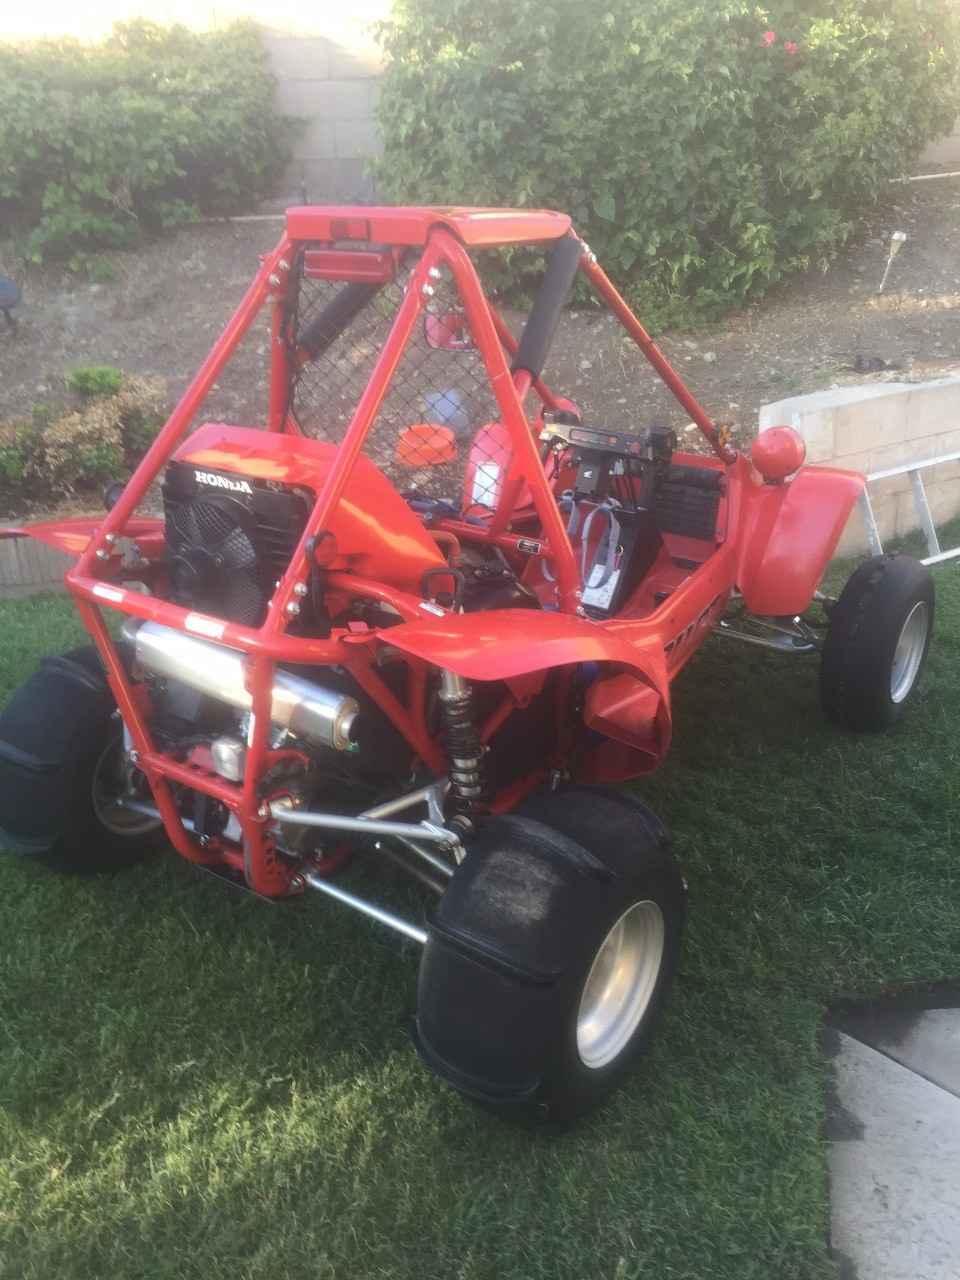 Used 1989 Honda PILOT FL400 ATVs For Sale In California $5,300